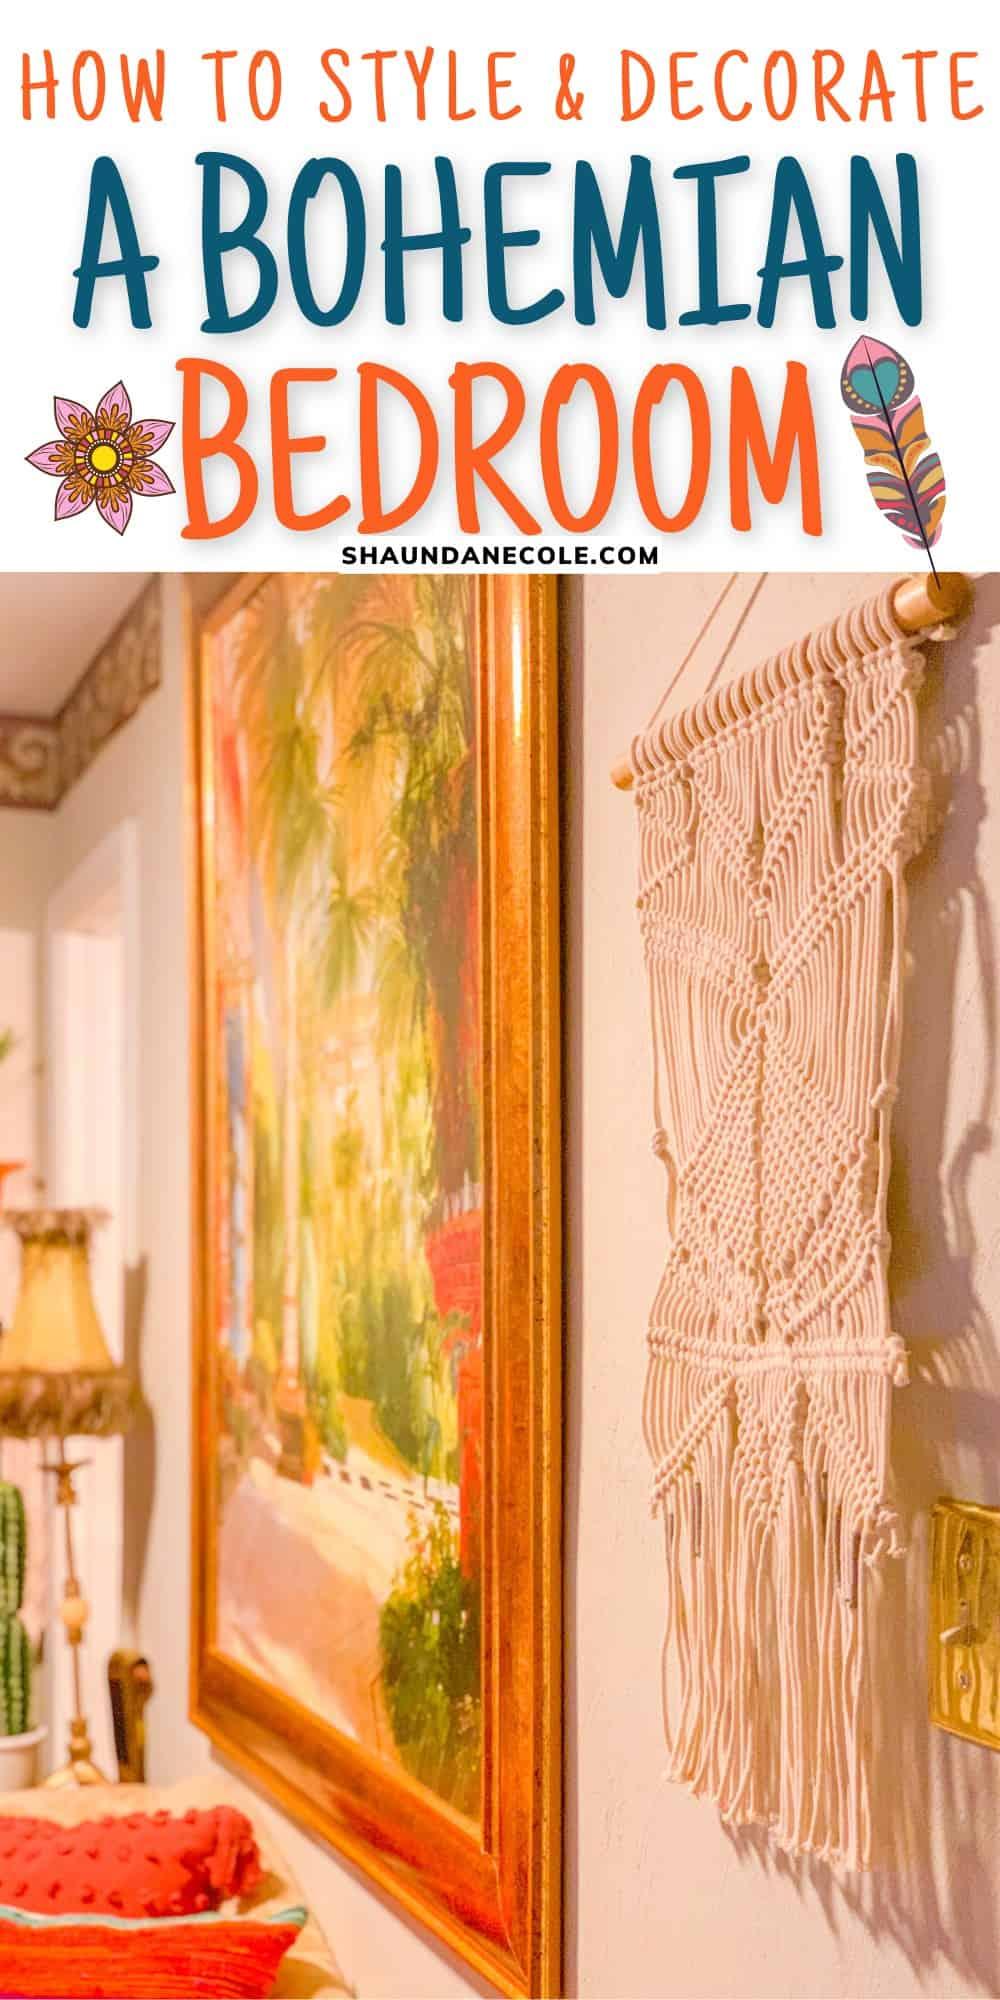 Bohemian Bedroom Decor Ideas & Inspiration